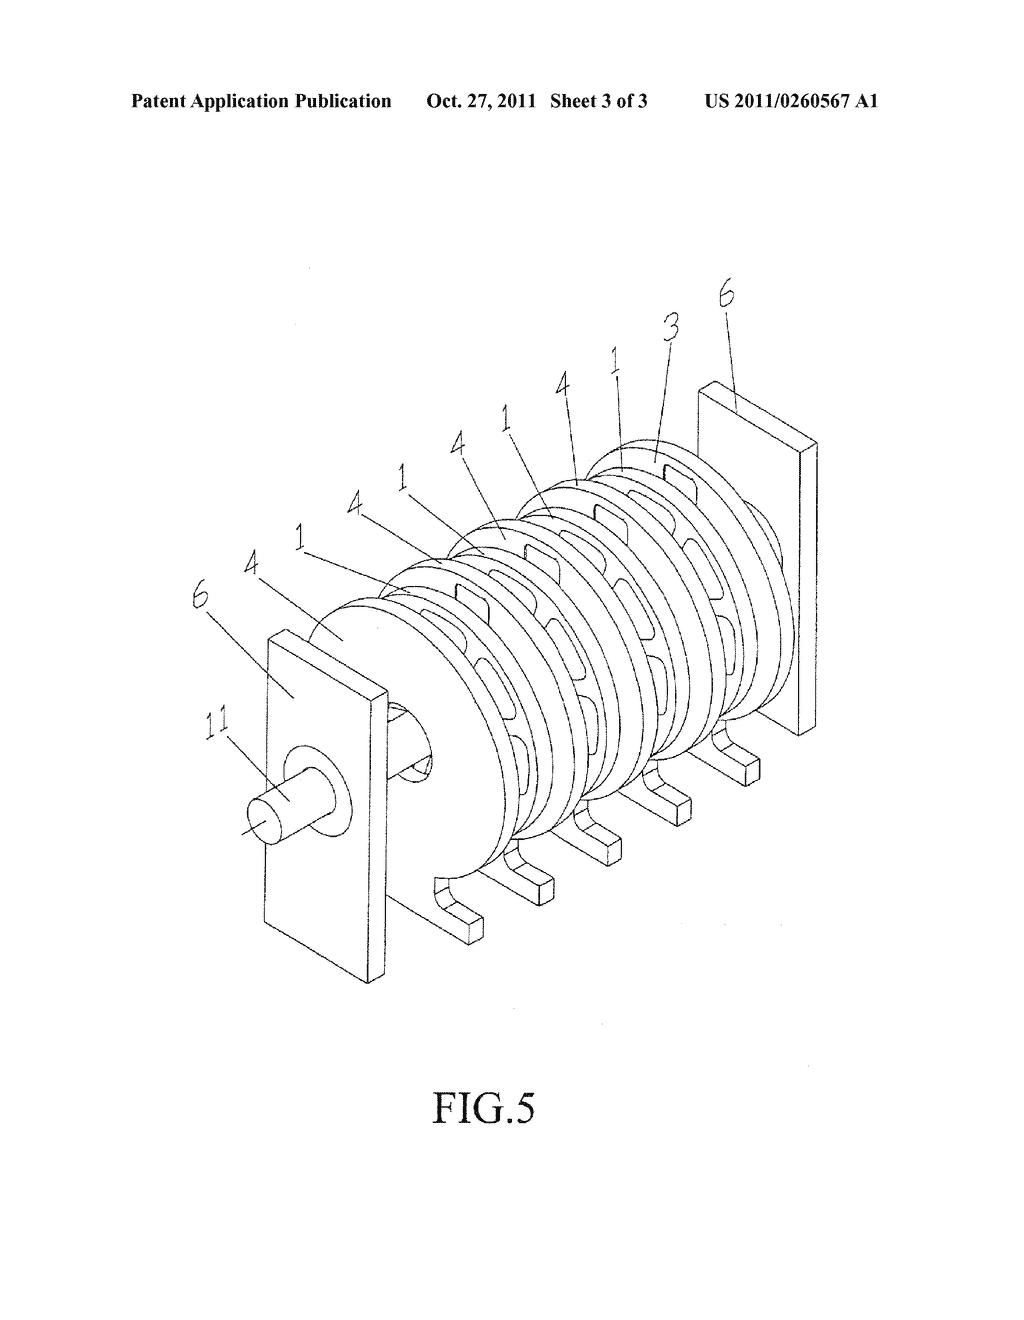 Armature Coil Diagram | Wiring Diagram on